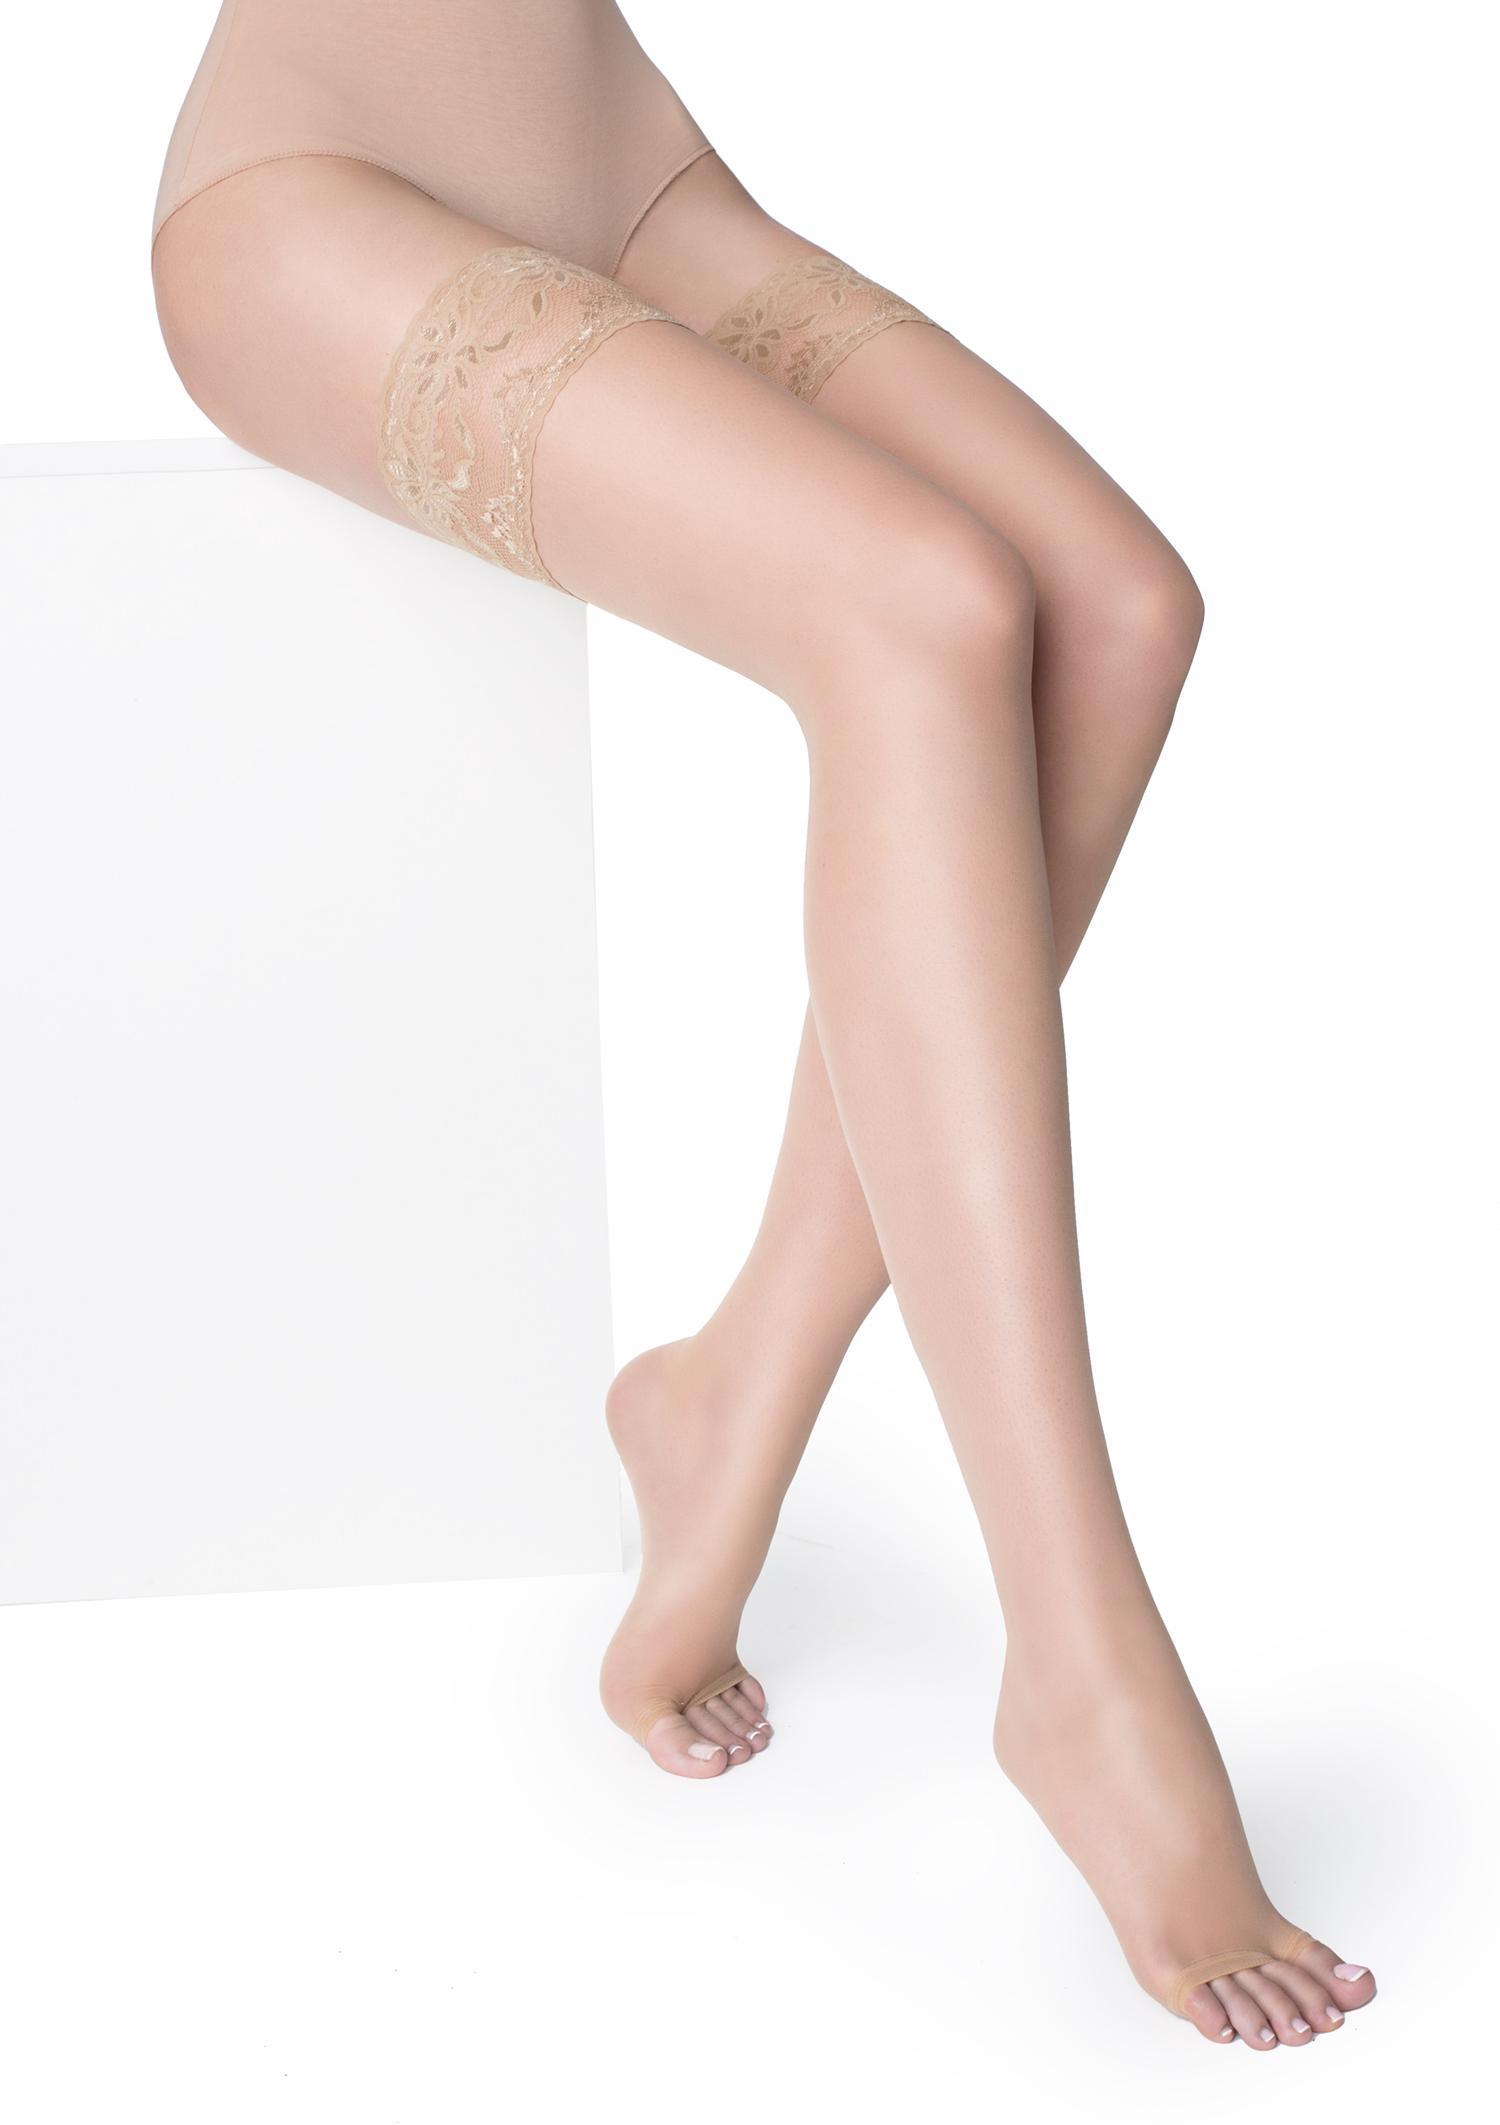 https://golden-legs.com.ua/images/stories/virtuemart/product/nudo_nf.jpg